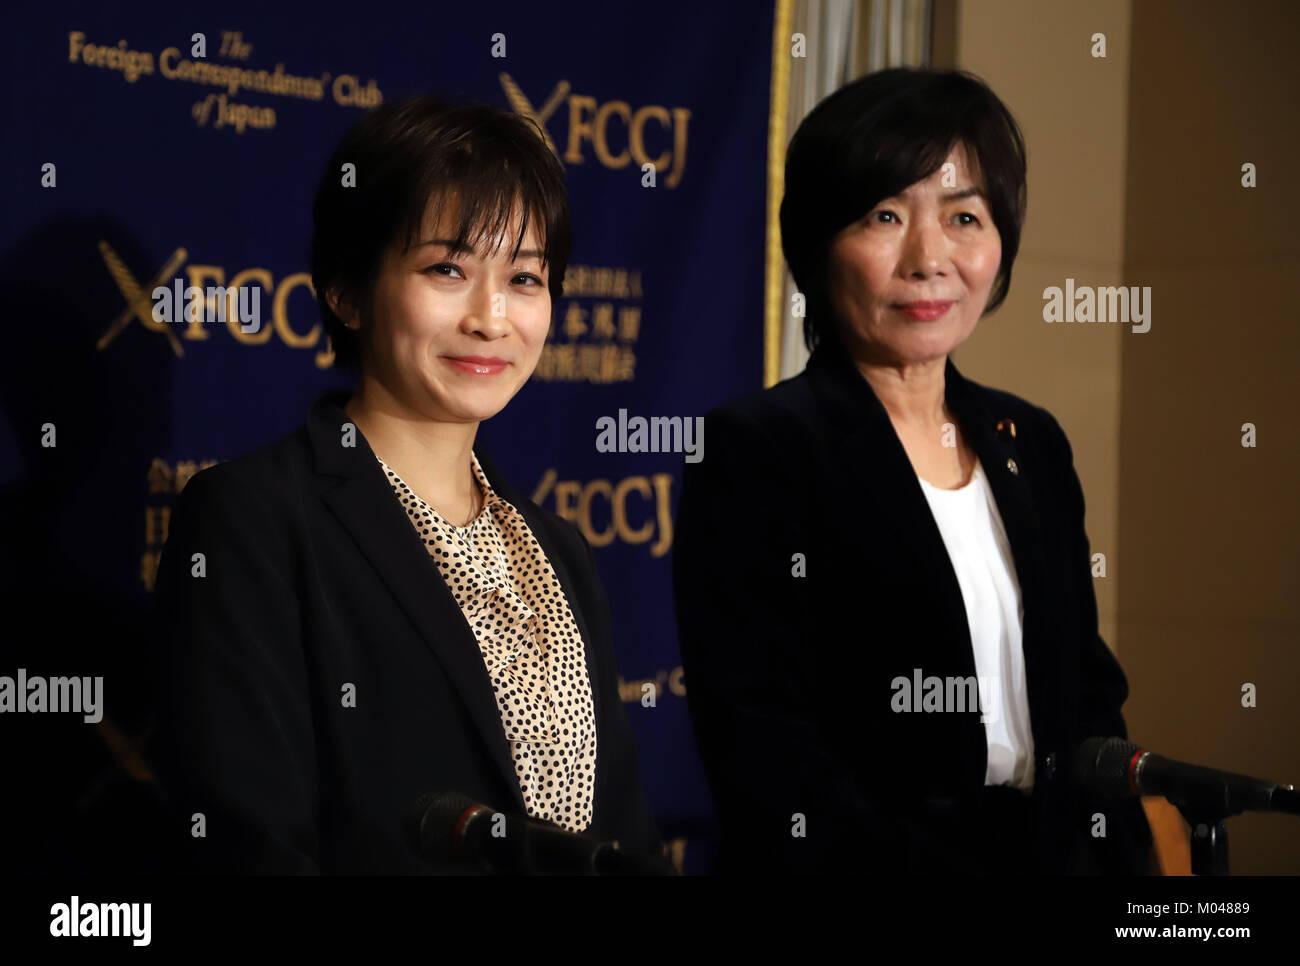 Tokyo, Japan. 19th Jan, 2018. Japan's Upper House lawmaker Yuko Mori (R) and Tokyo Shimbun reporter Isoko Mochizuki - Stock Image